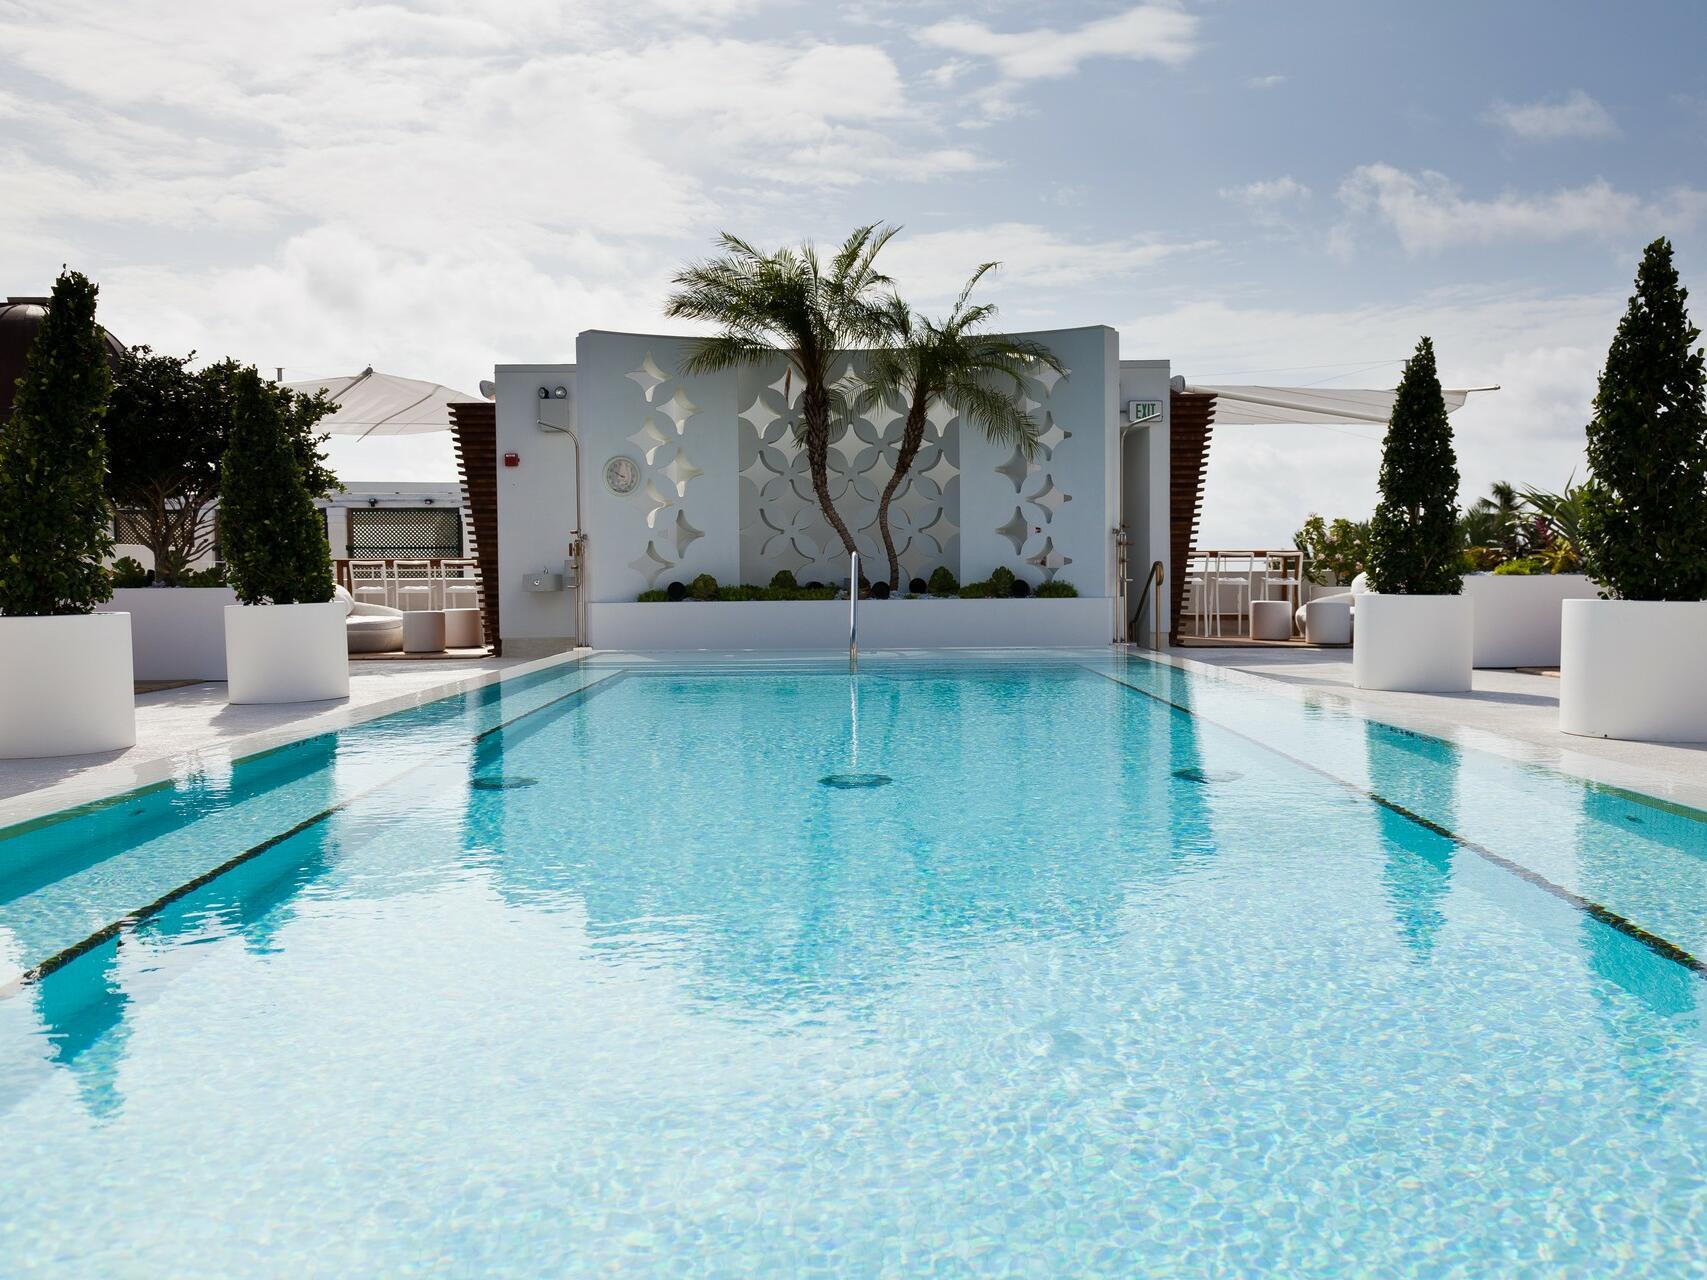 Rooftop Pool & 2 cabanas in Highbar at Dream South Beach